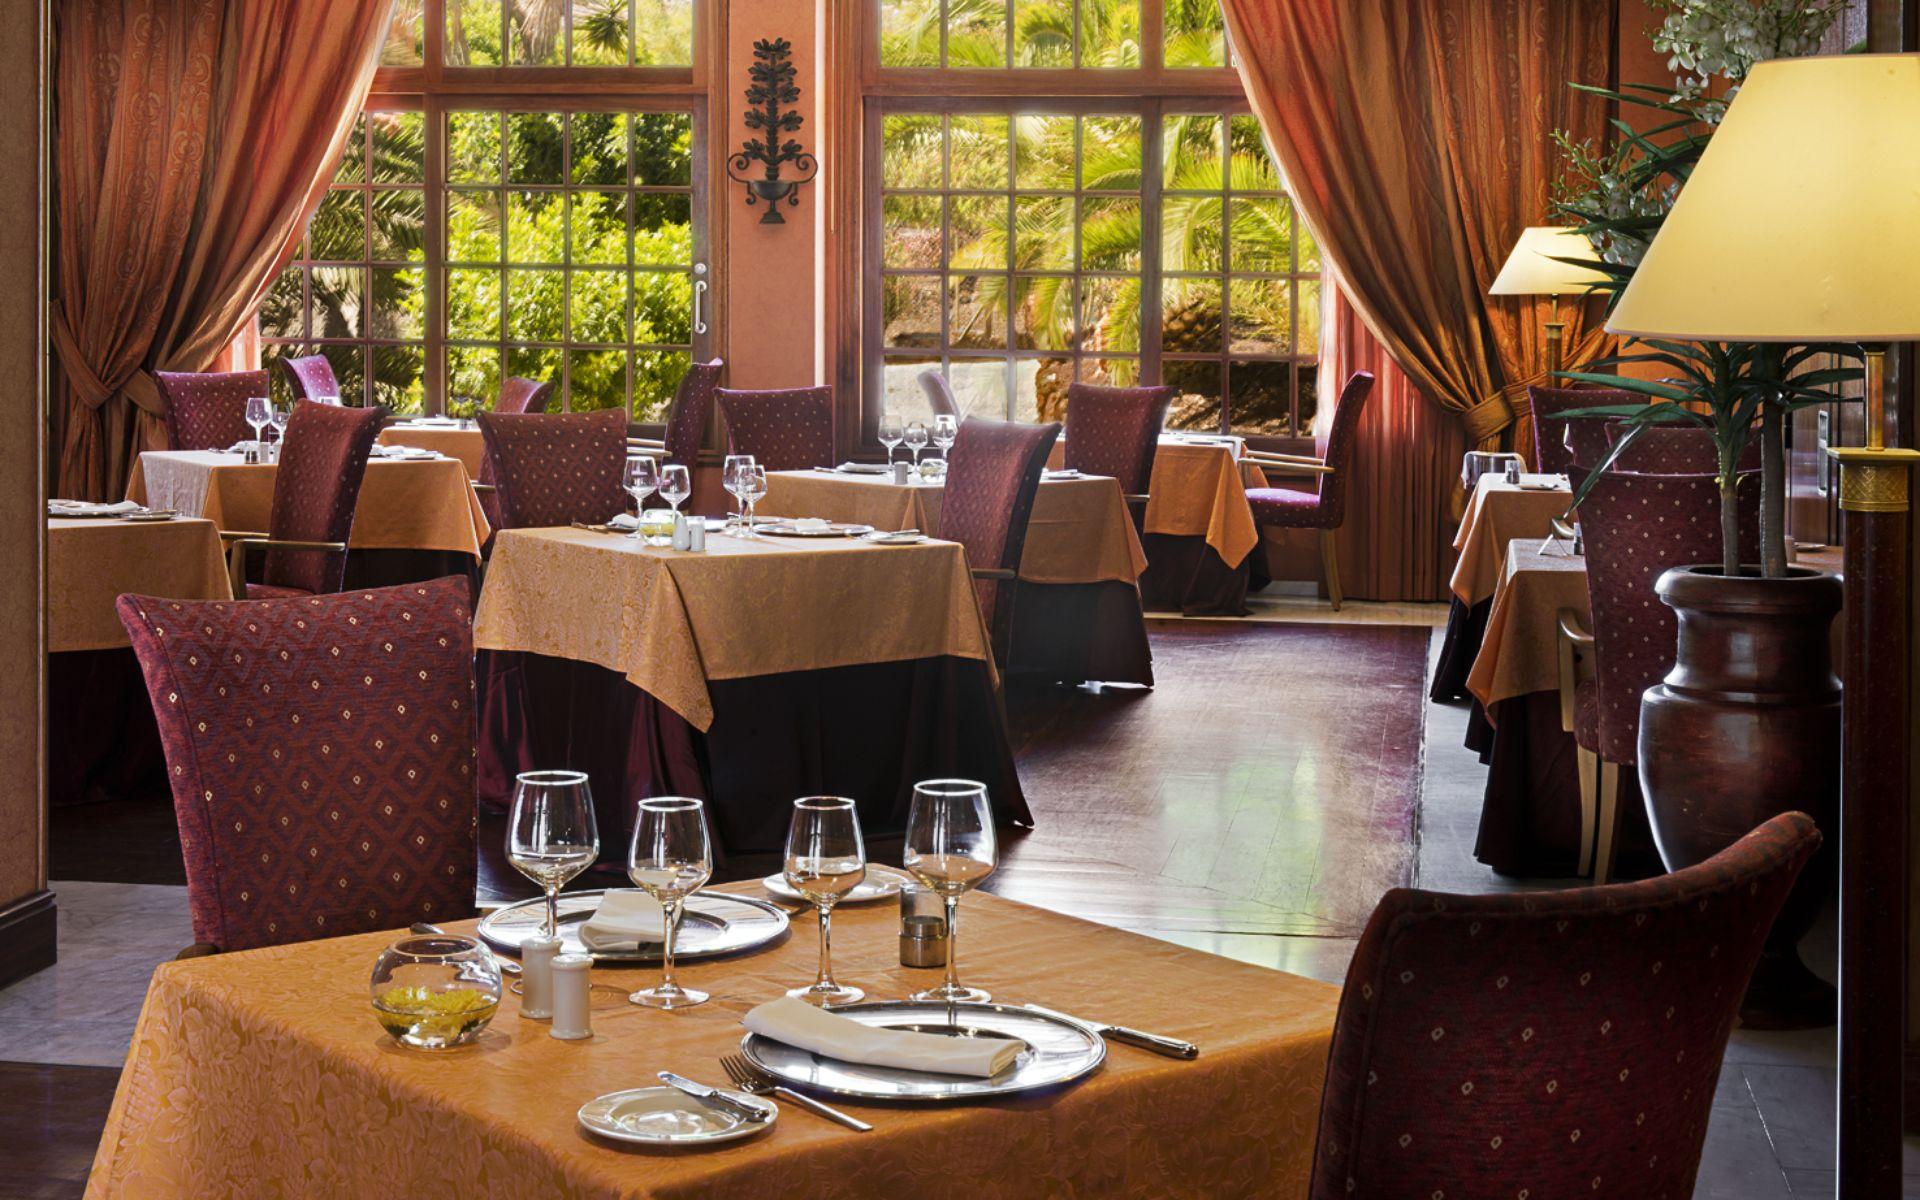 Baños Turcos Zona Caleta:Hotel Elba Palace Golf en Caleta De Fuste – Fuerteventura desde 70 €